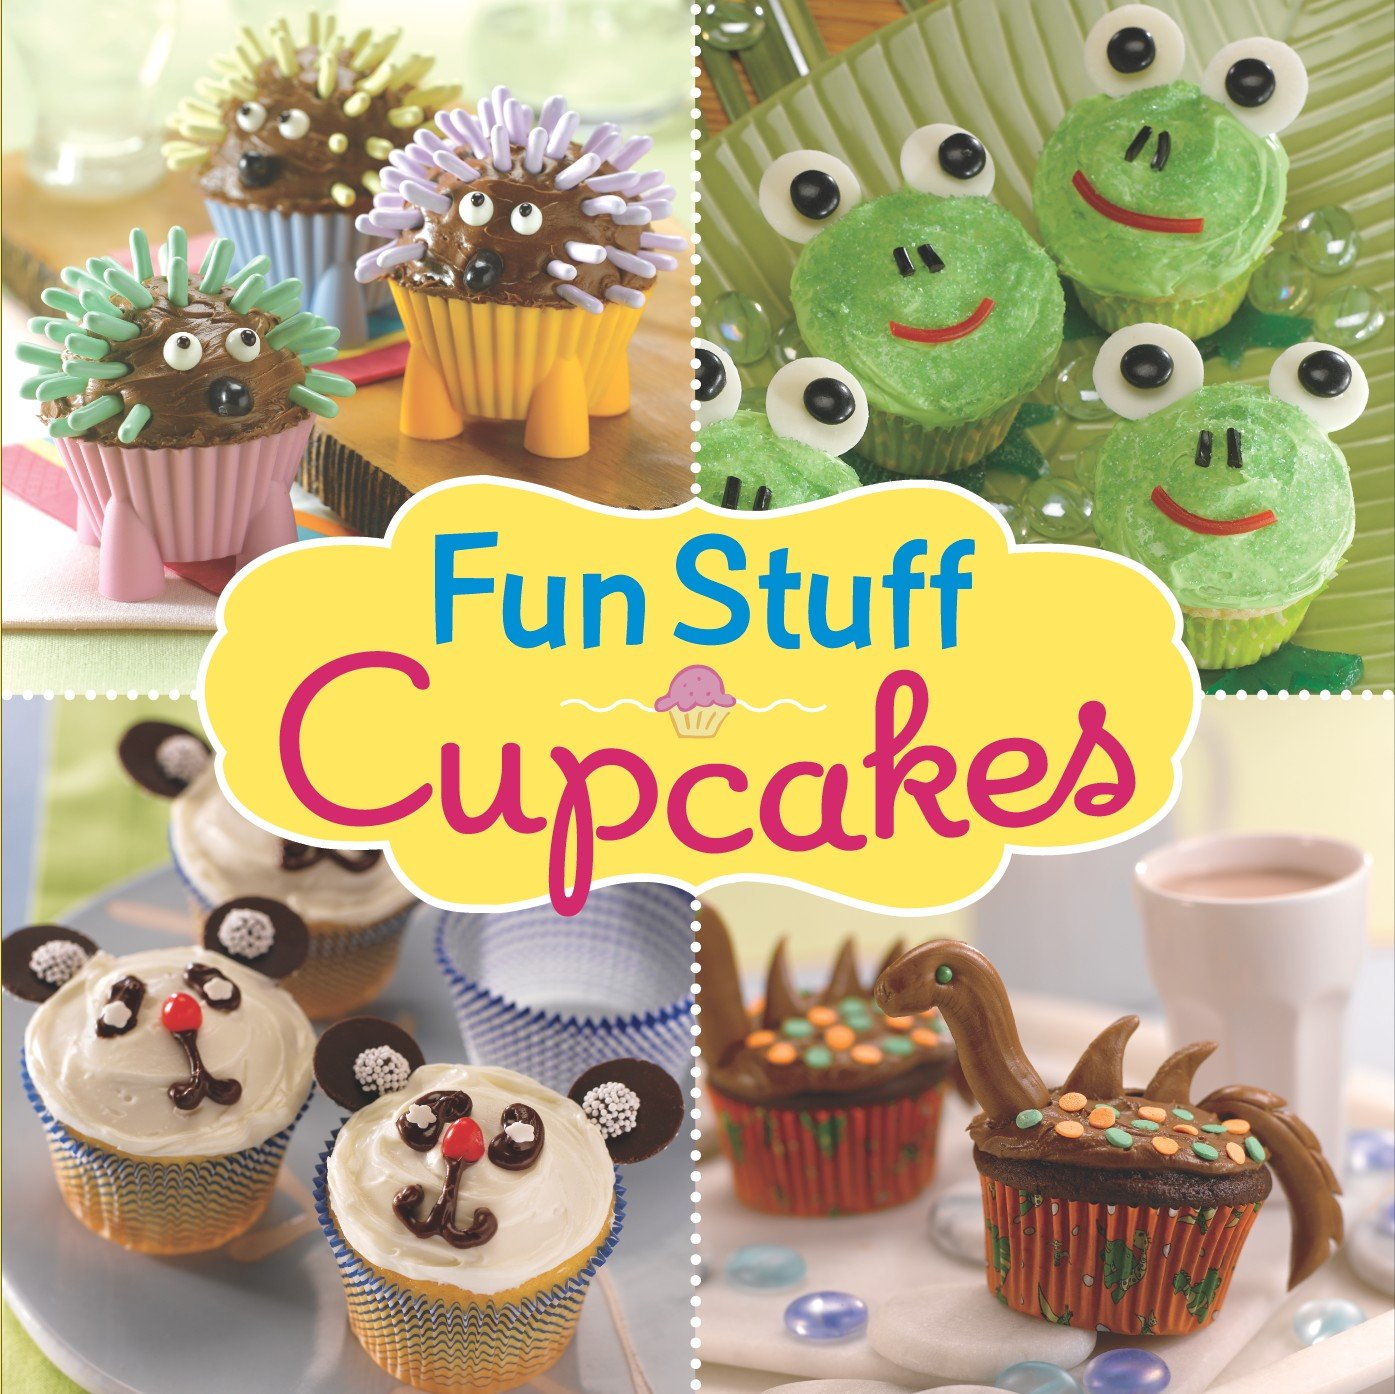 Fun Stuff Cupcakes Editors of Publications International Ltd